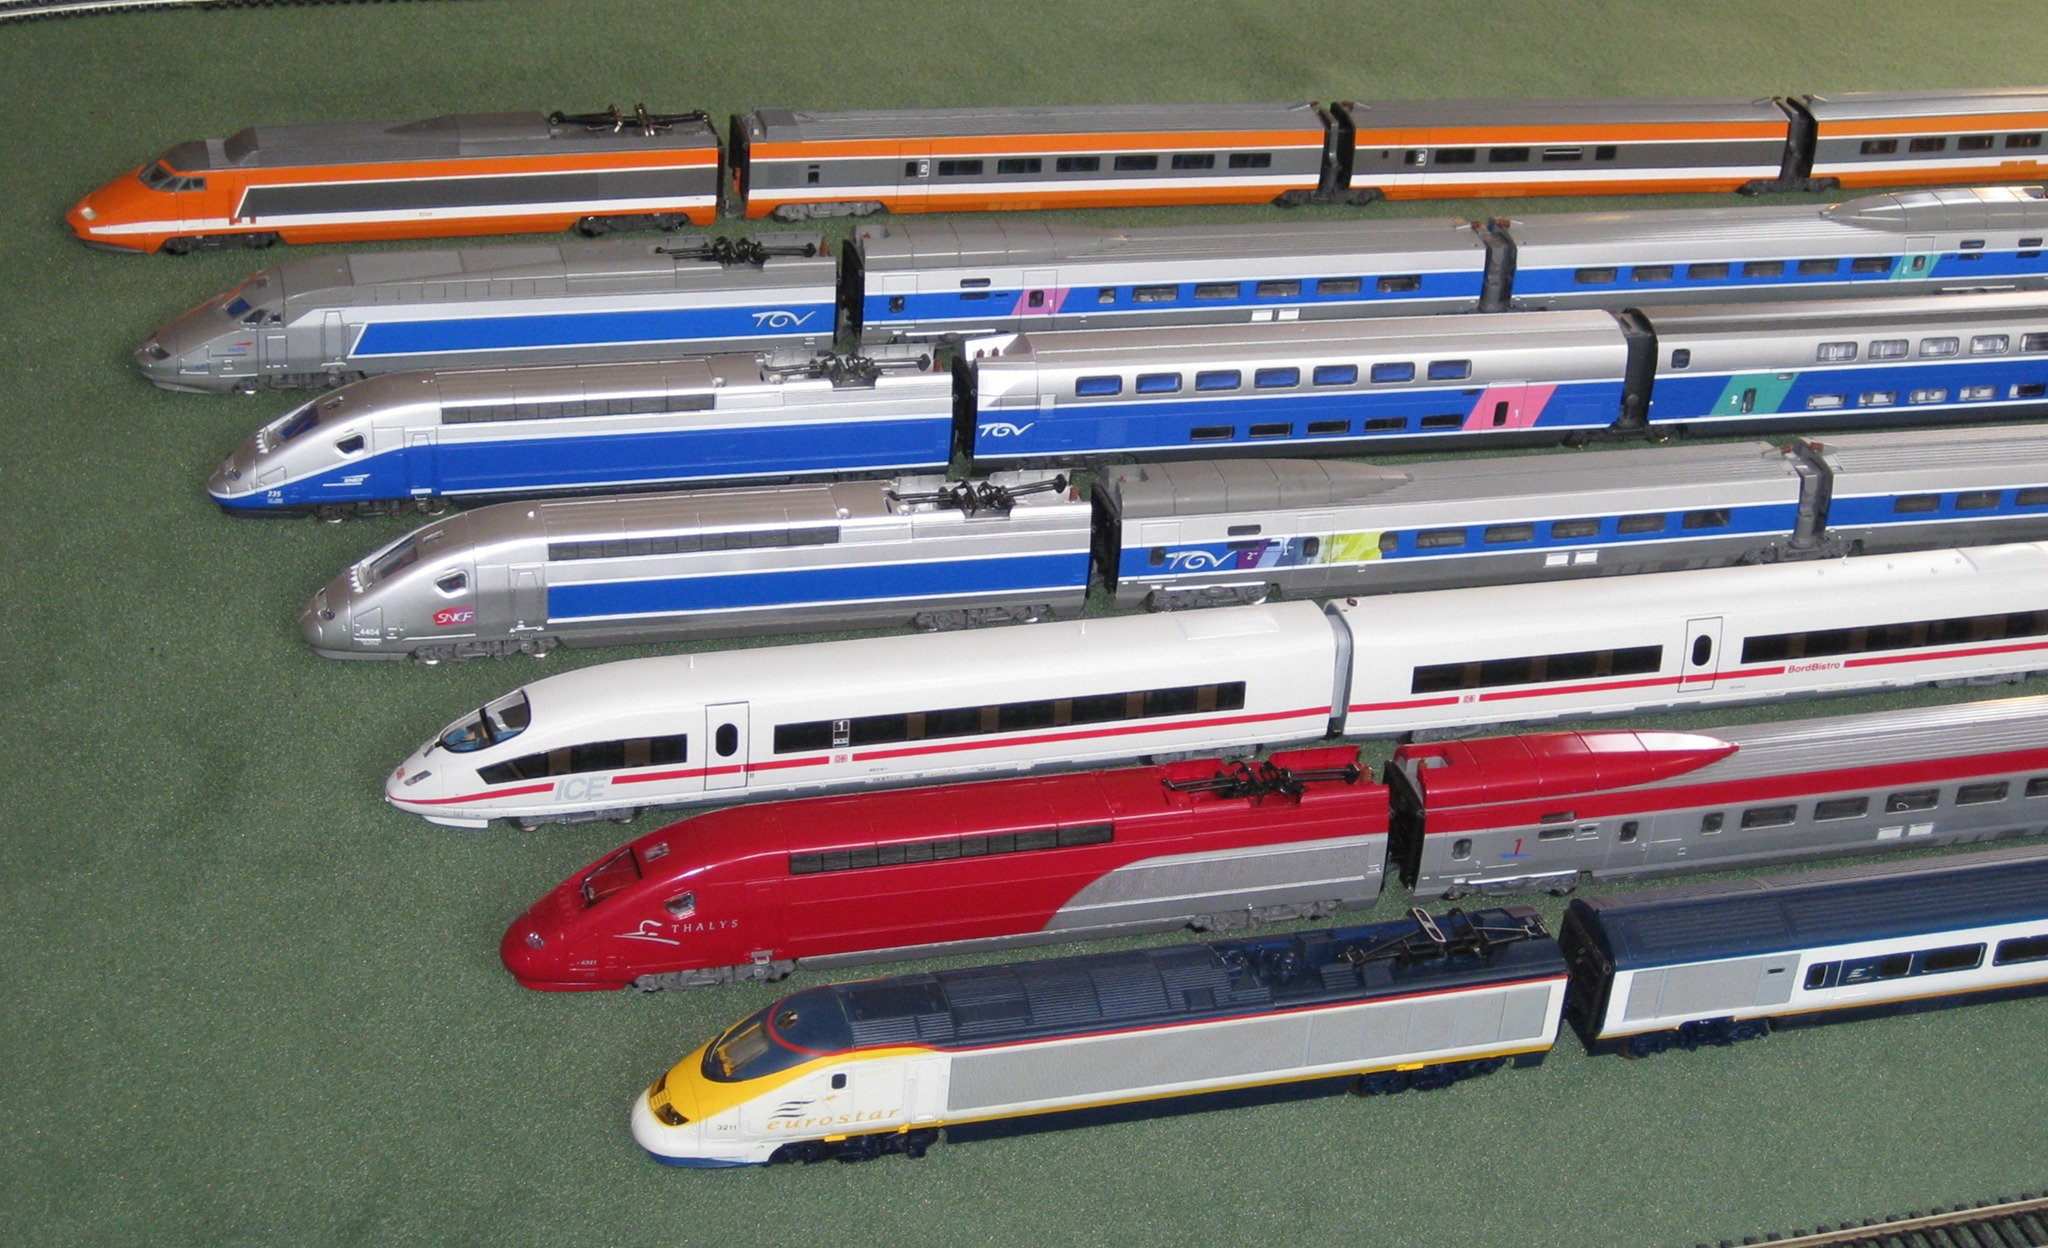 collection de trains grande vitesse les trains. Black Bedroom Furniture Sets. Home Design Ideas